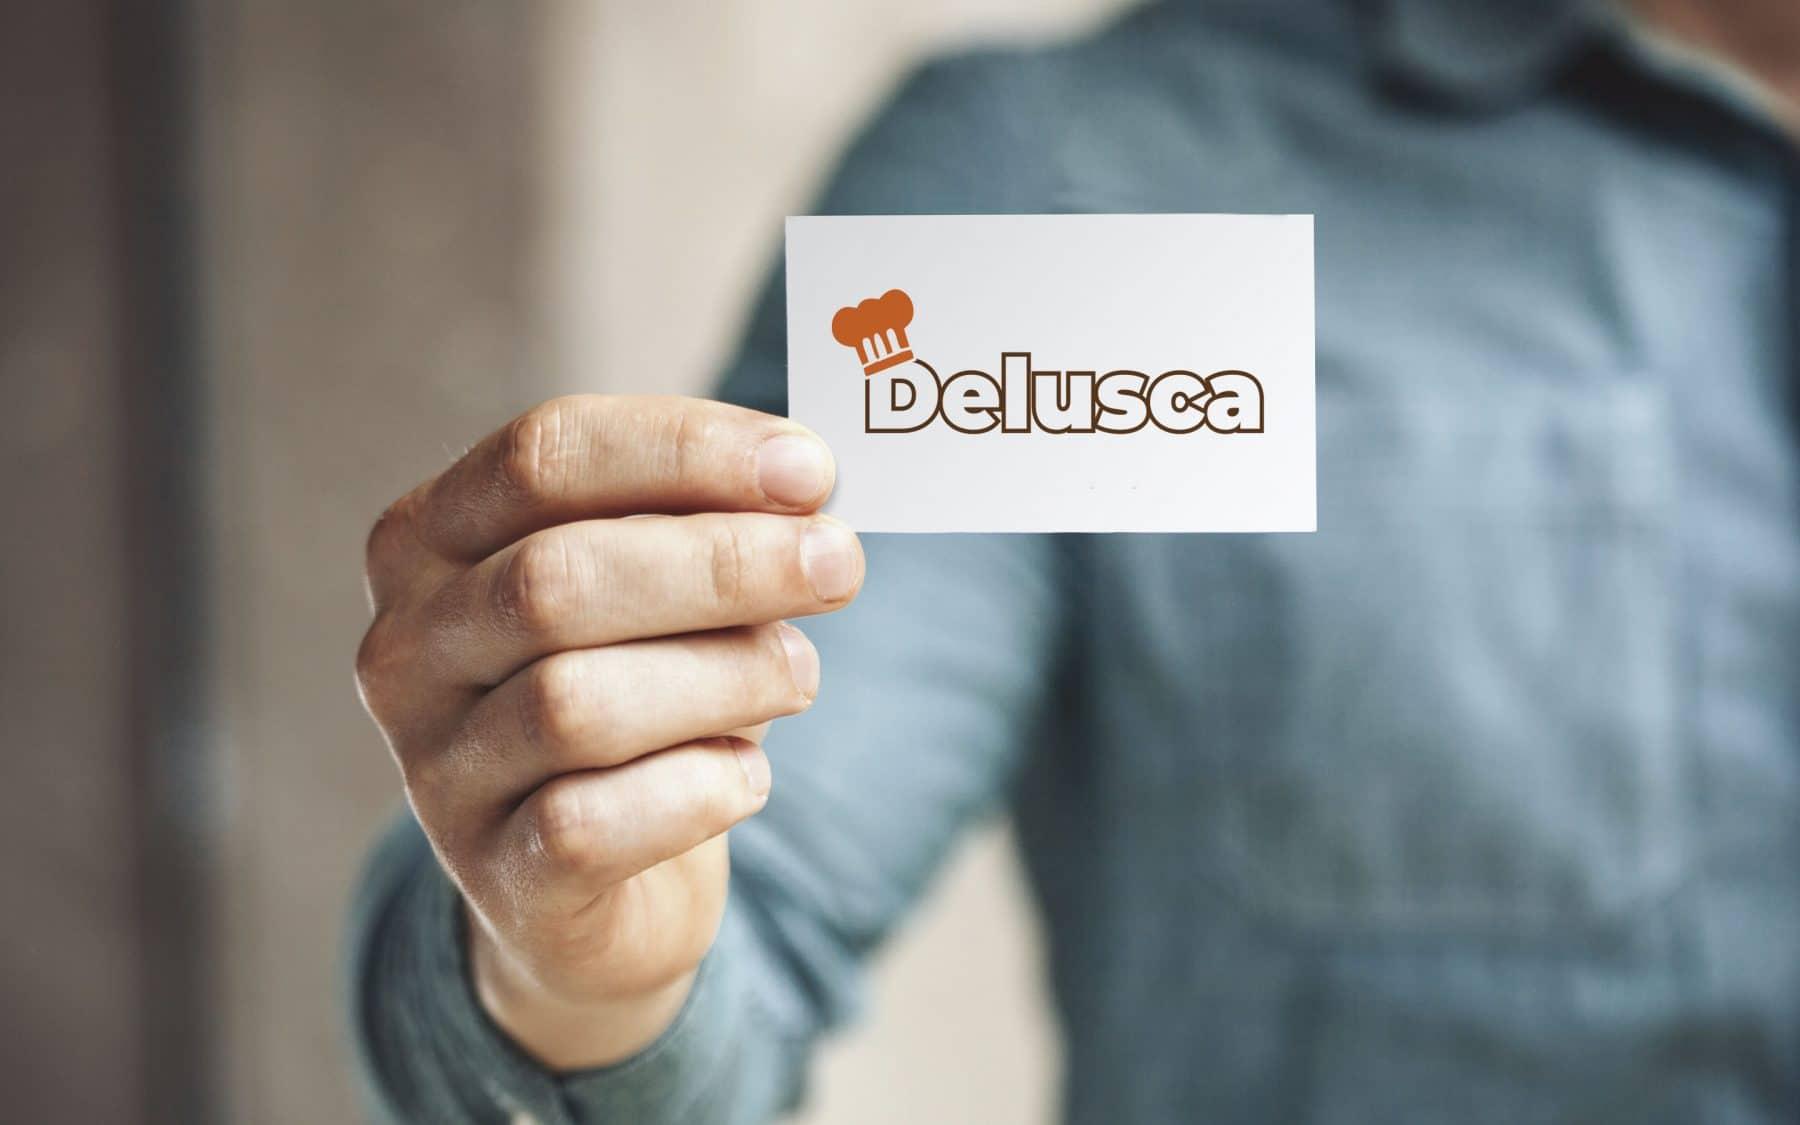 Delusca 1